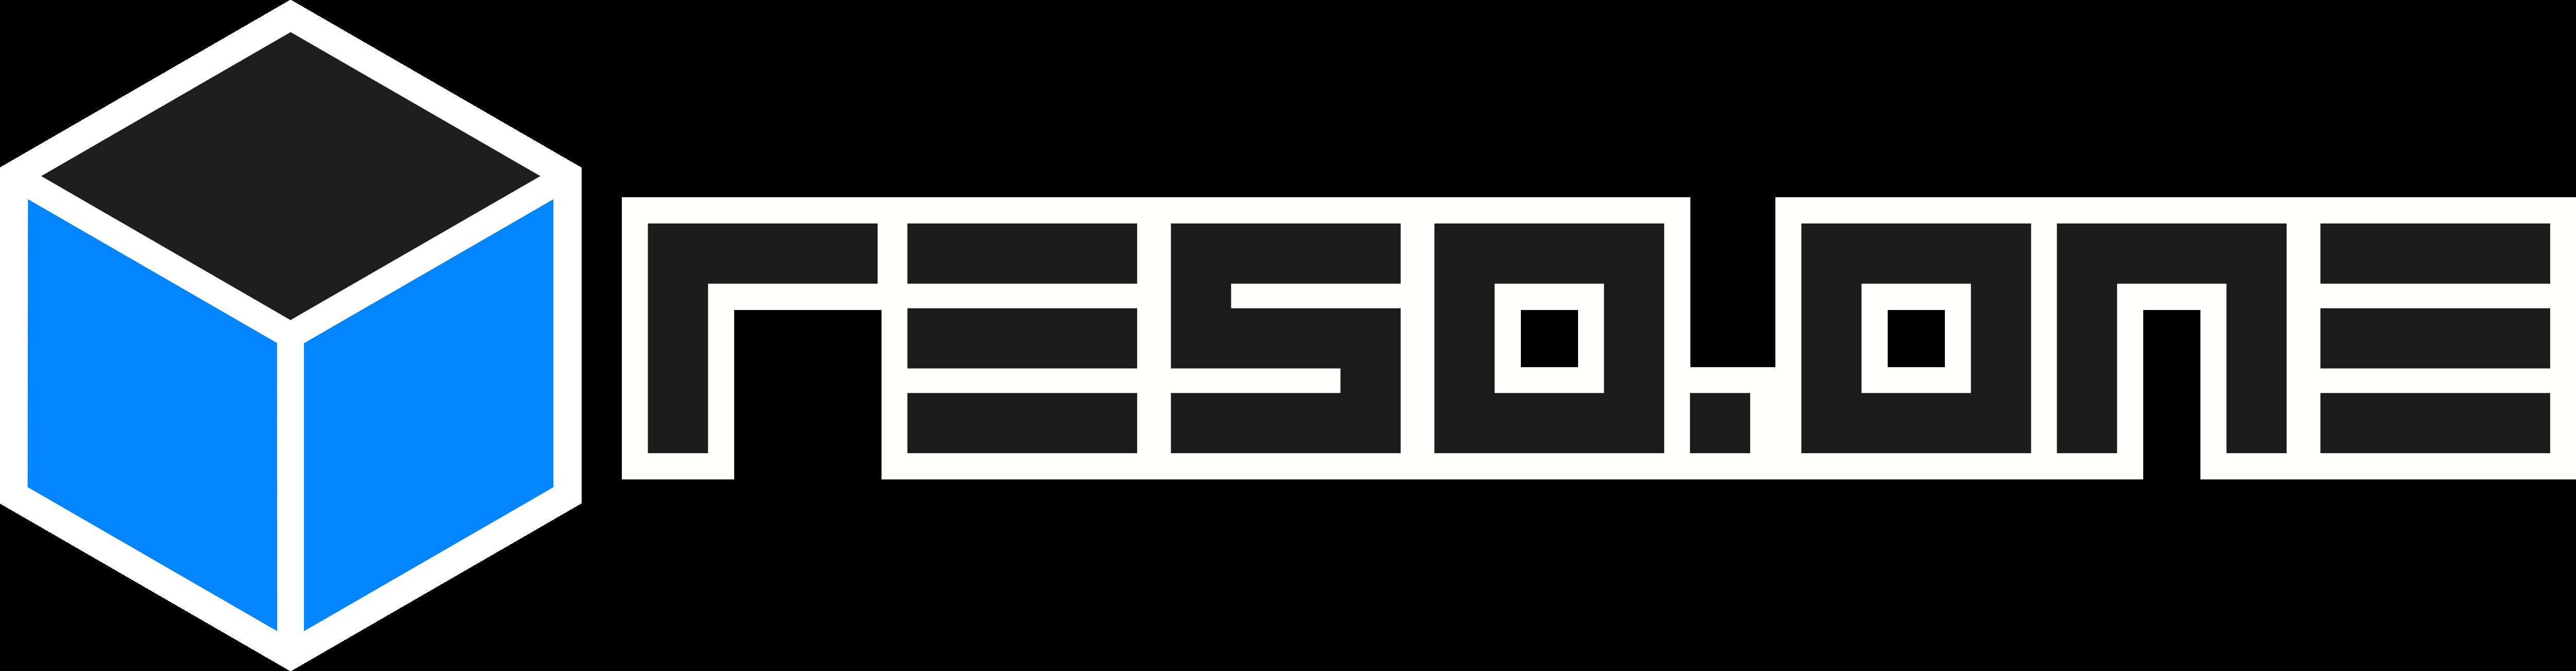 Reso_Logo_farbig_white_stroke_domain